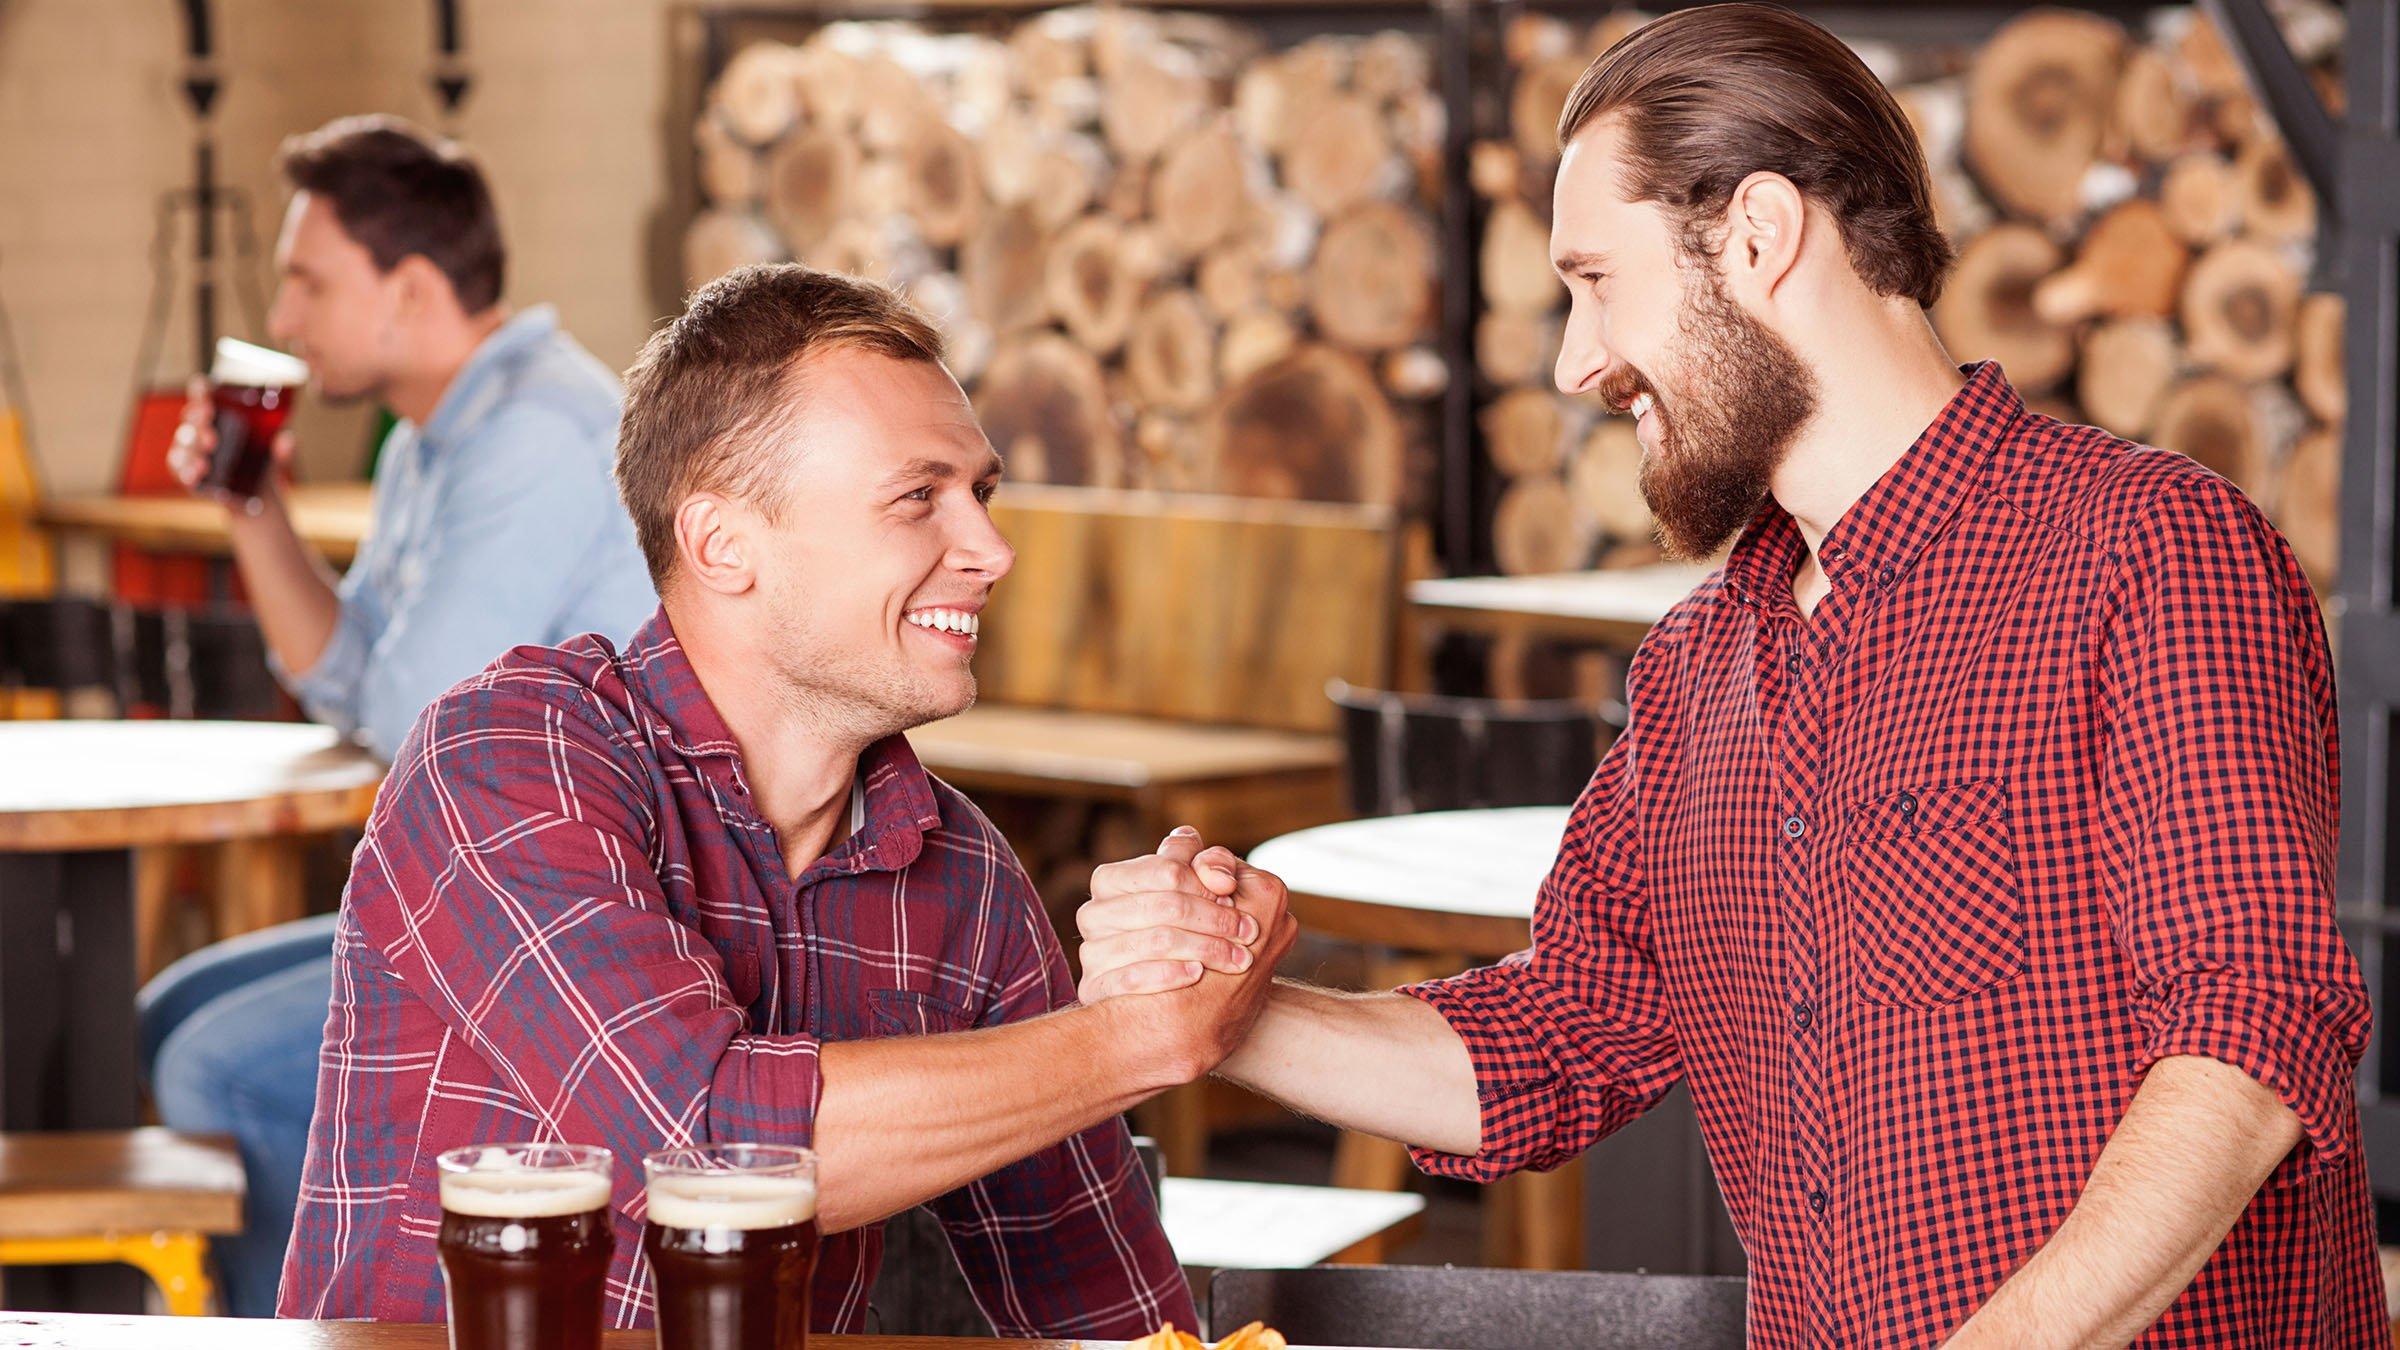 costumbres de Australia saludo hombres